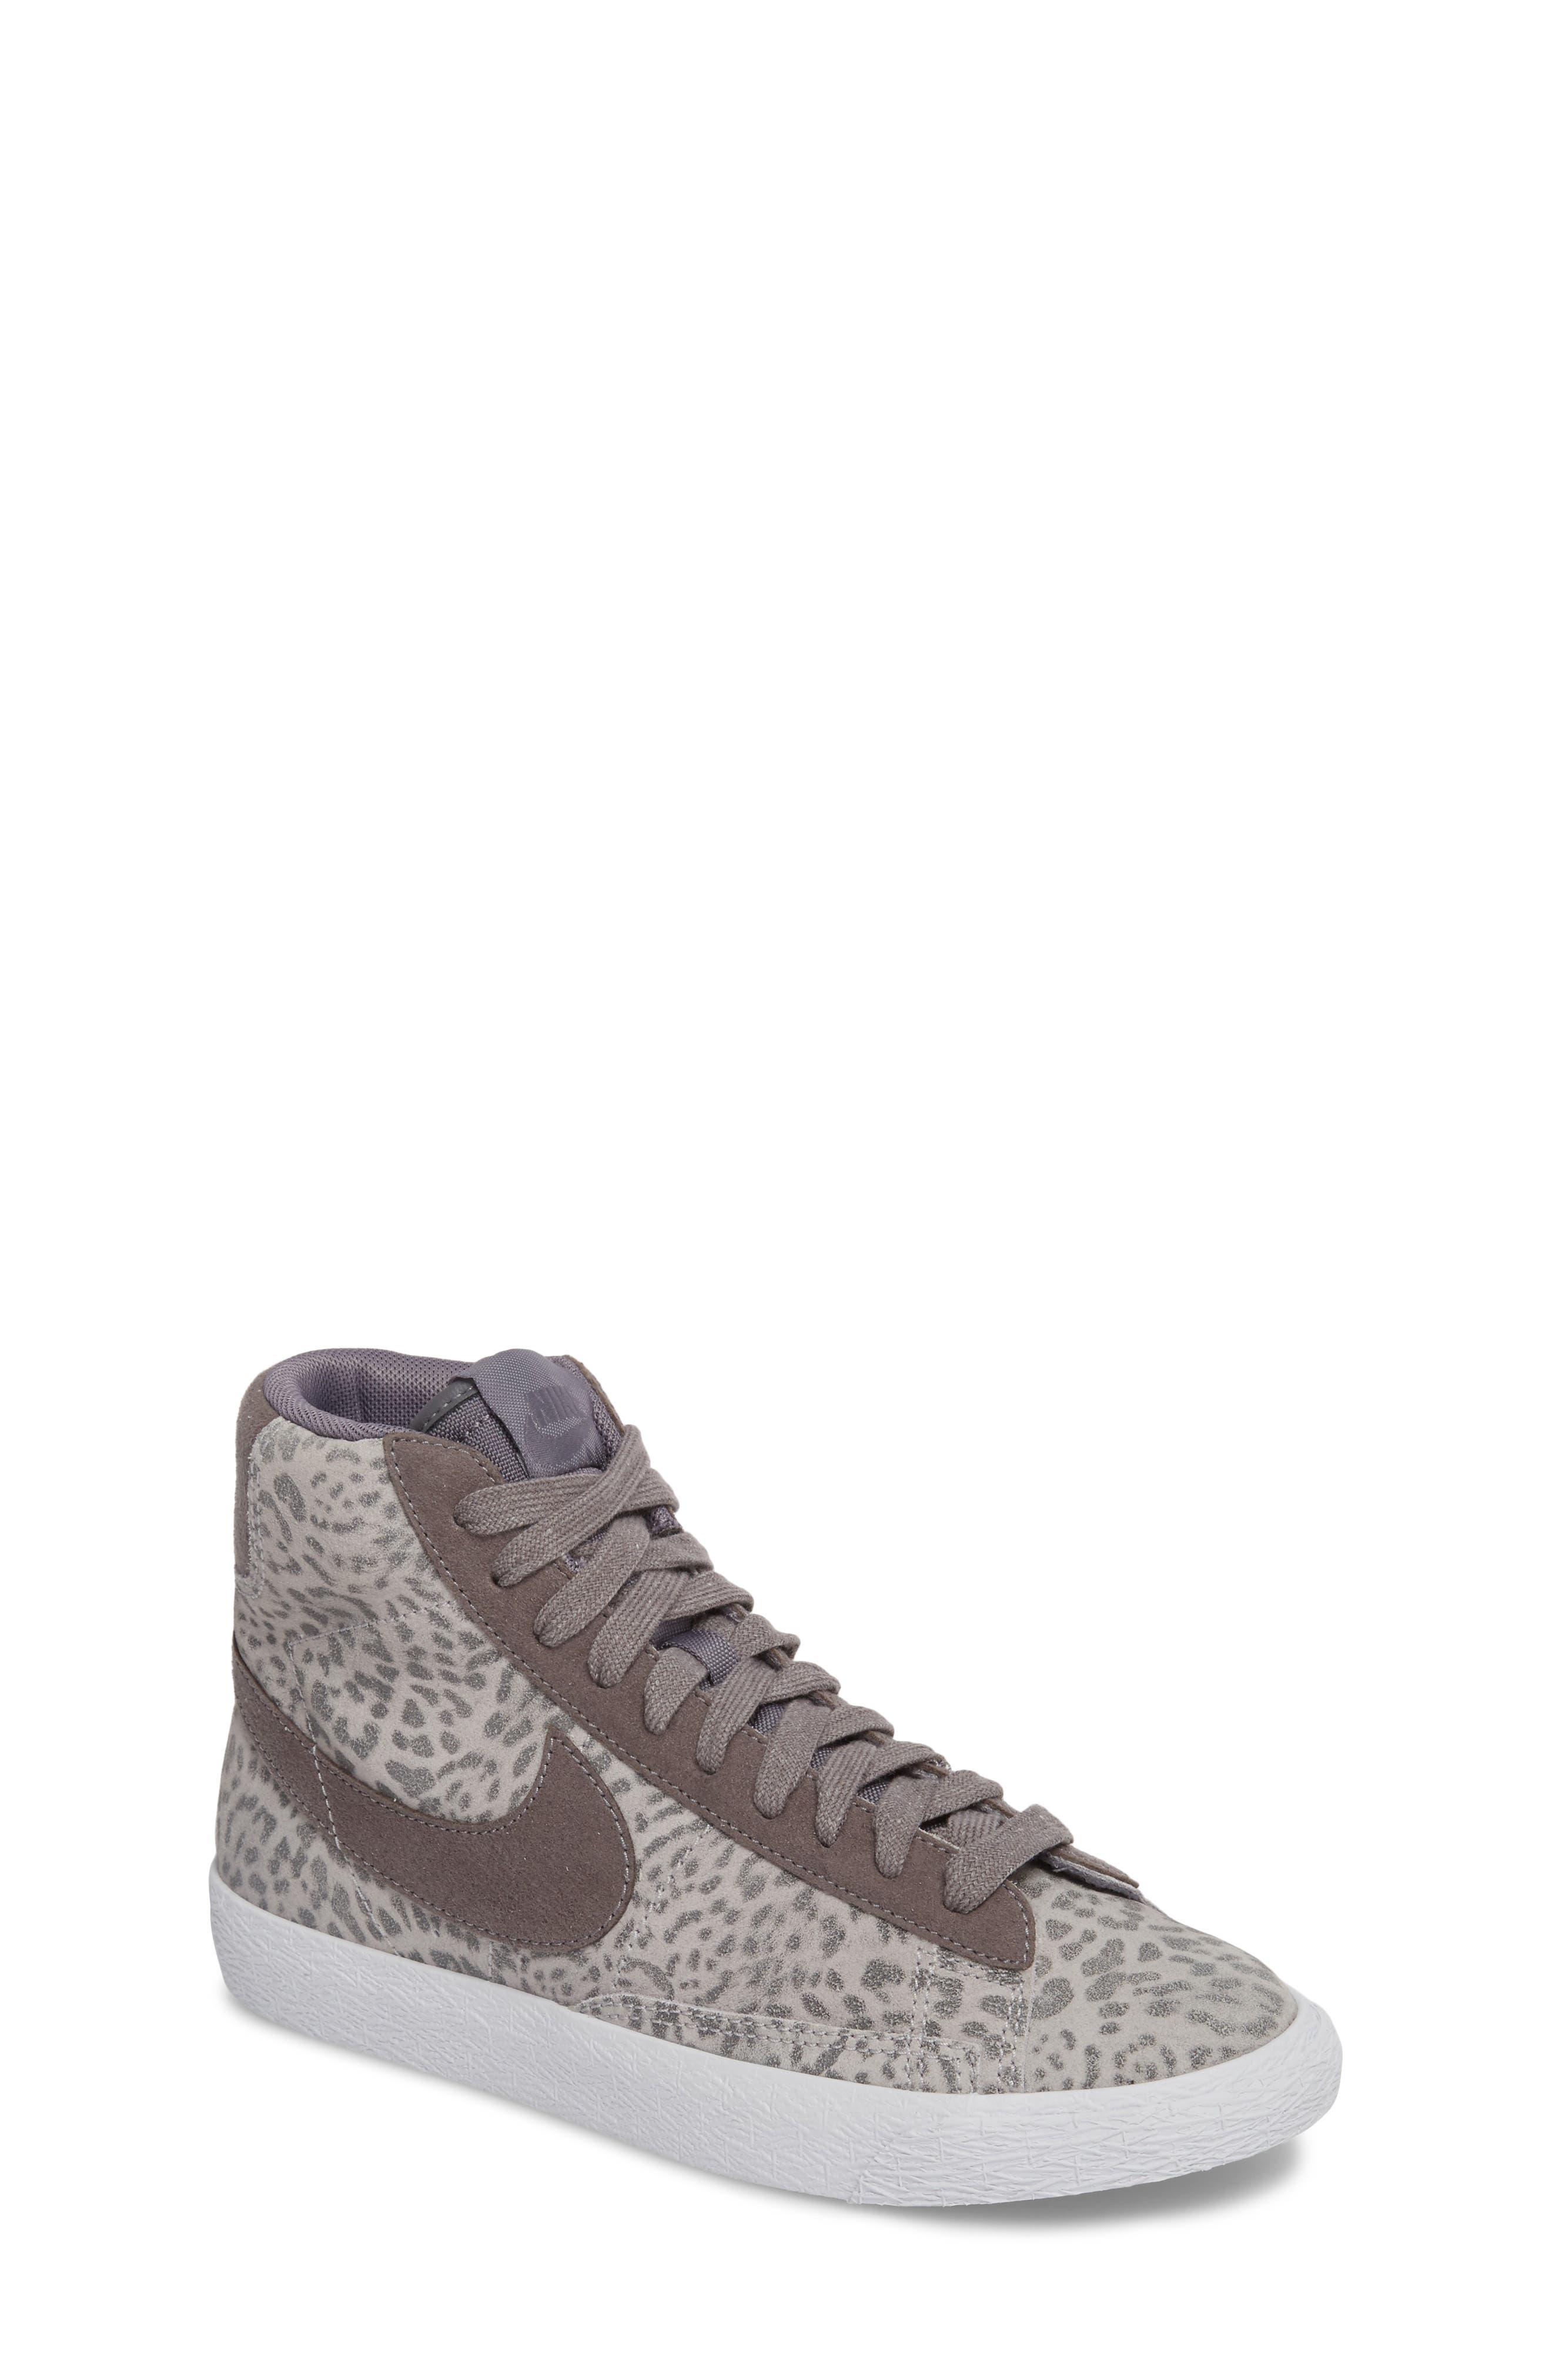 Blazer Mid SE High Top Sneaker,                         Main,                         color,